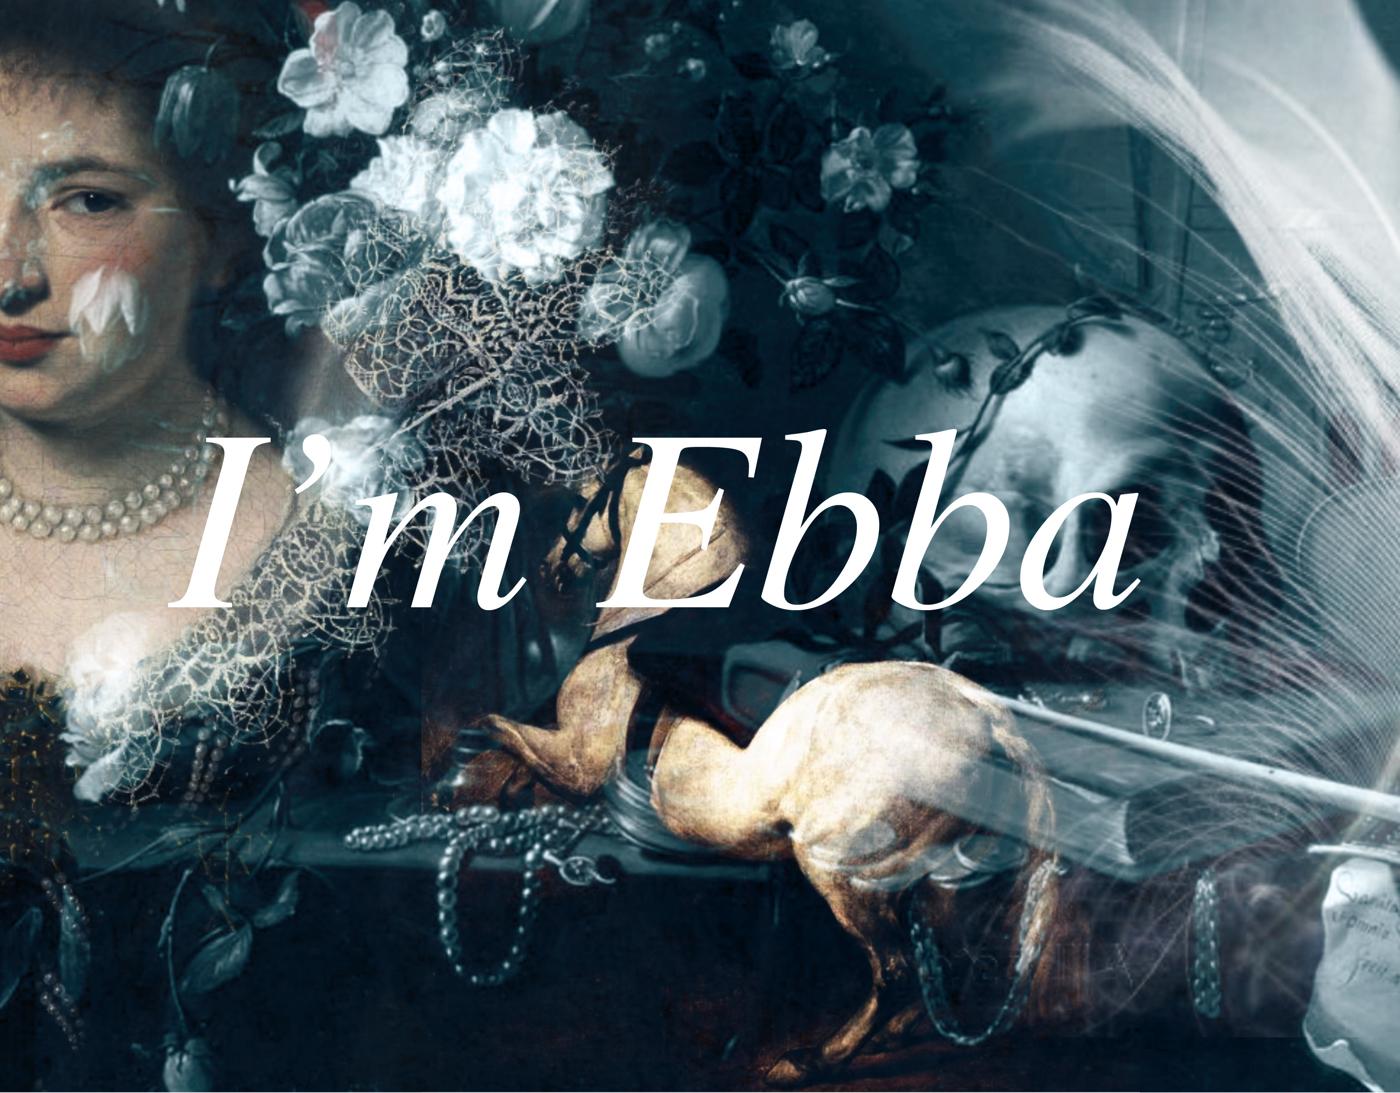 Image Source : Ebba Brahe